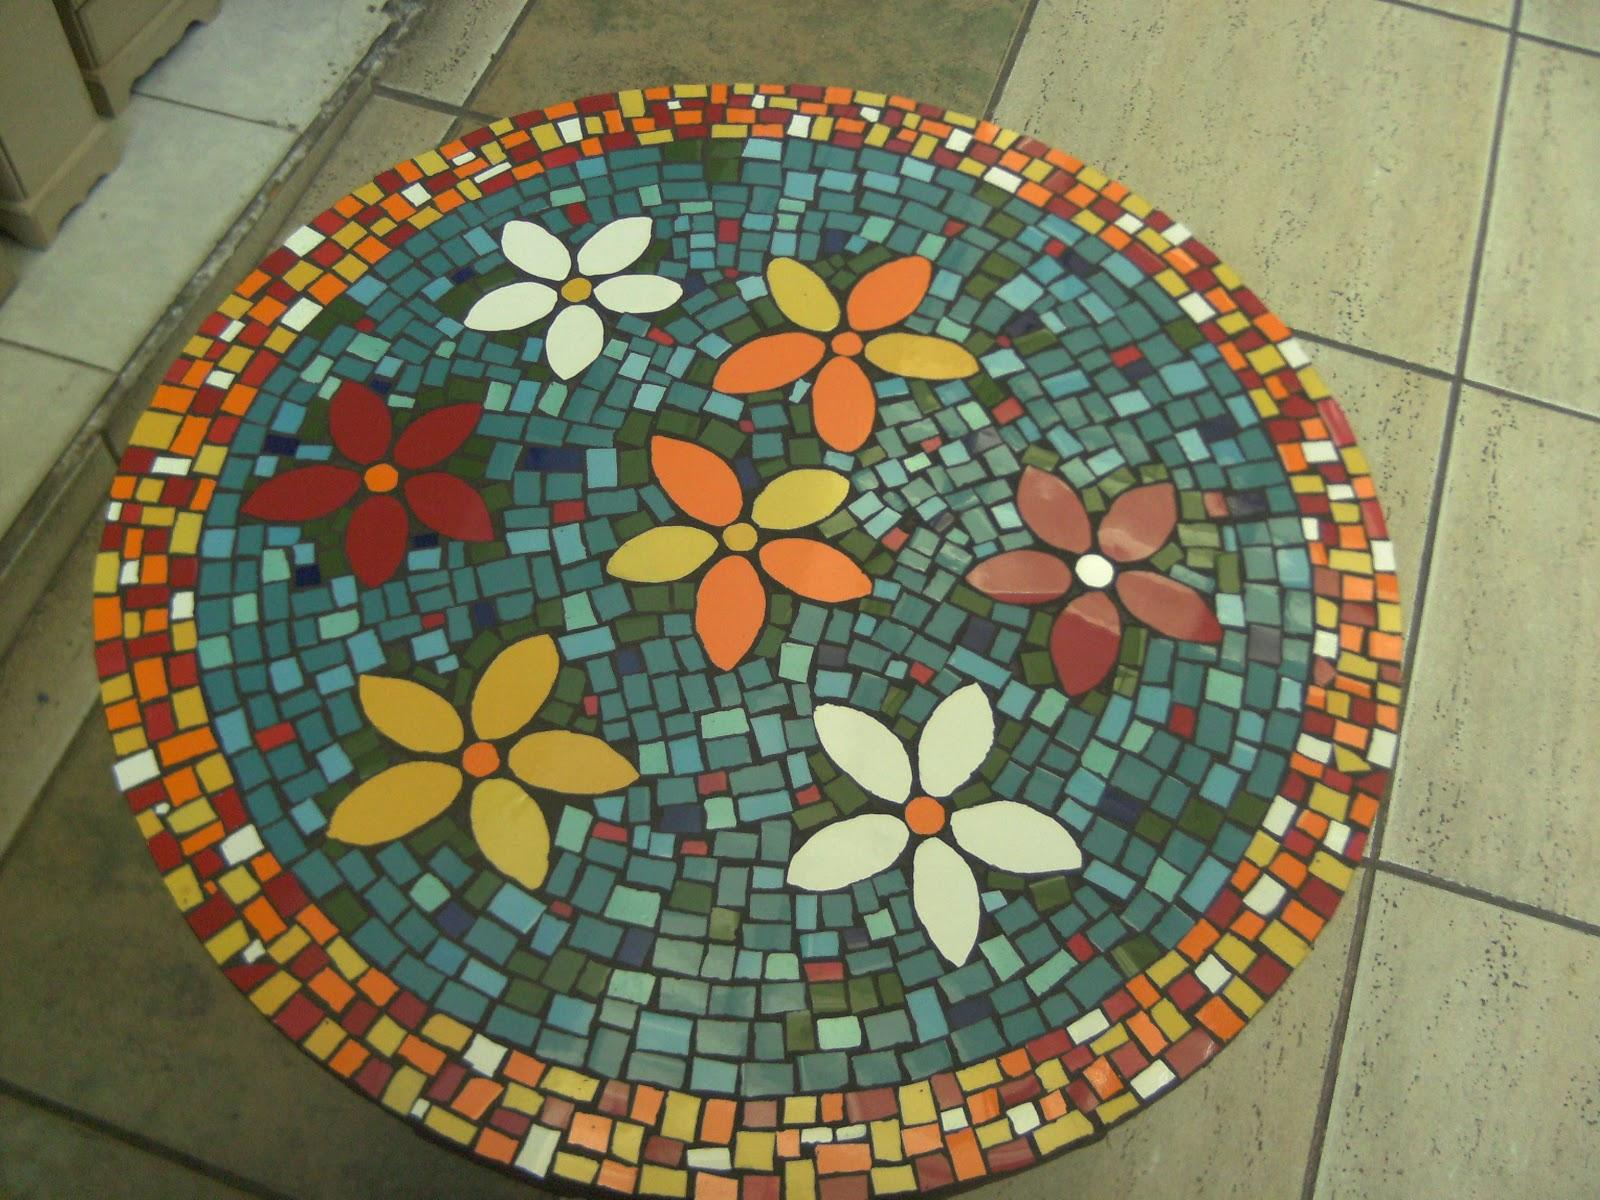 Artesanias lina mayo 2012 - Mosaico de madera ...